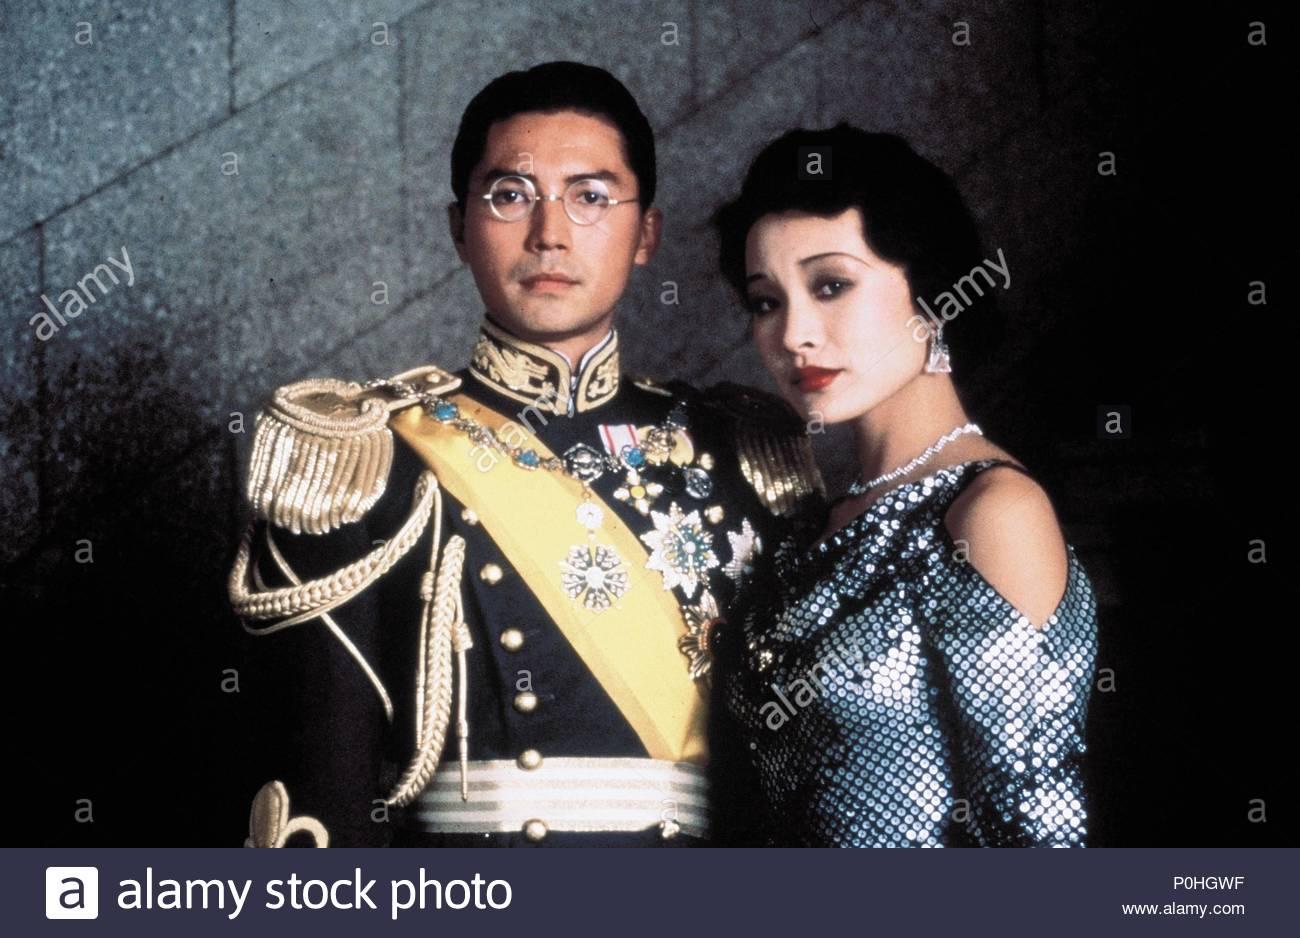 ca4b28fe94 Original Film Title  THE LAST EMPEROR. English Title  THE LAST EMPEROR.  Film Director  BERNARDO BERTOLUCCI. Year  1987. Stars  JOAN CHEN  JOHN LONE.